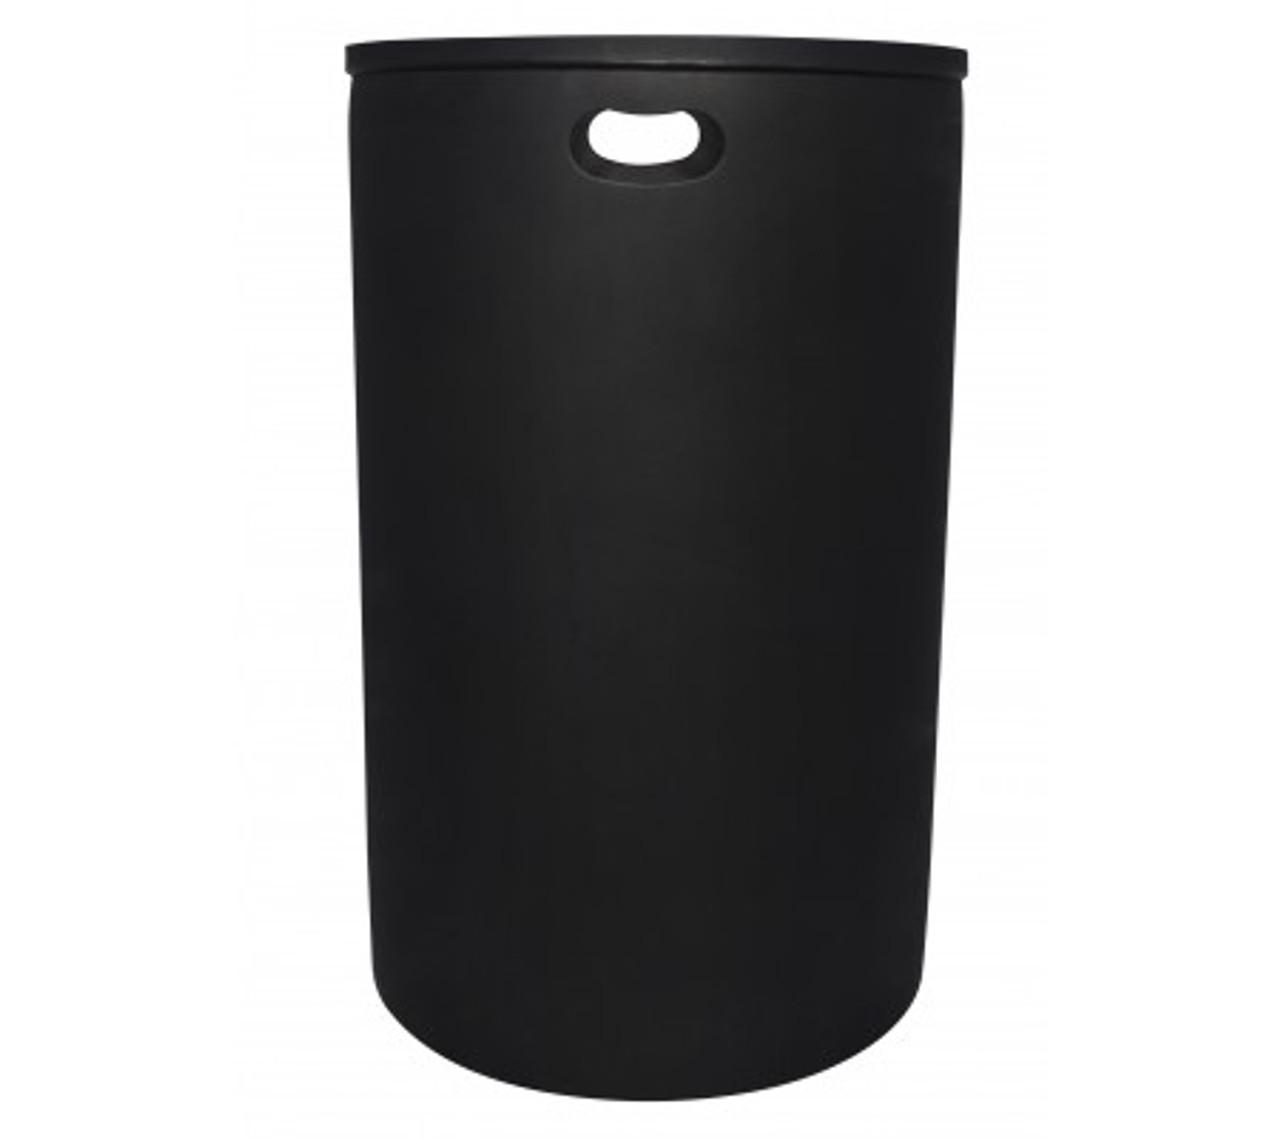 East & South Hampton Black Plastic 45 Gallon Liner